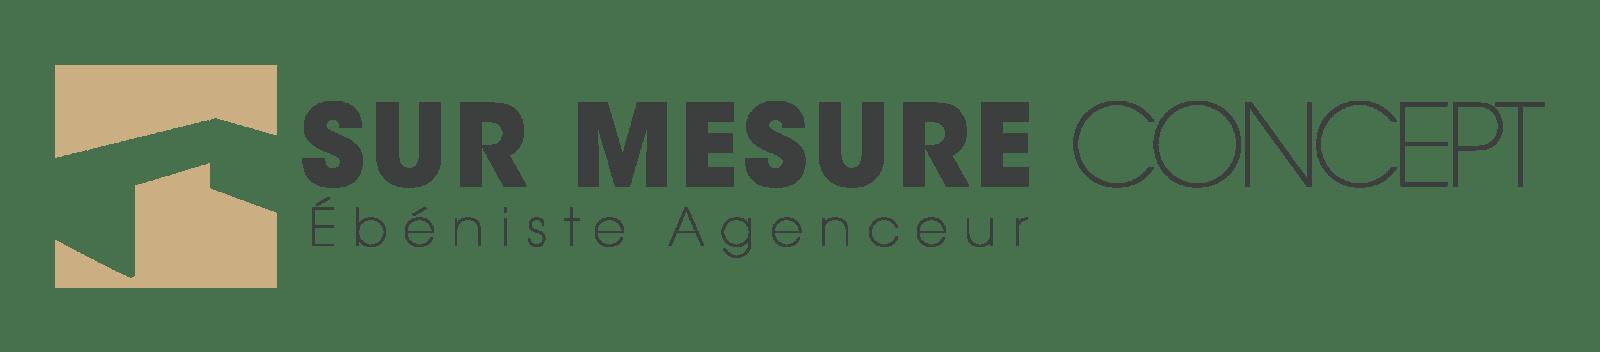 logo sur mesure concept